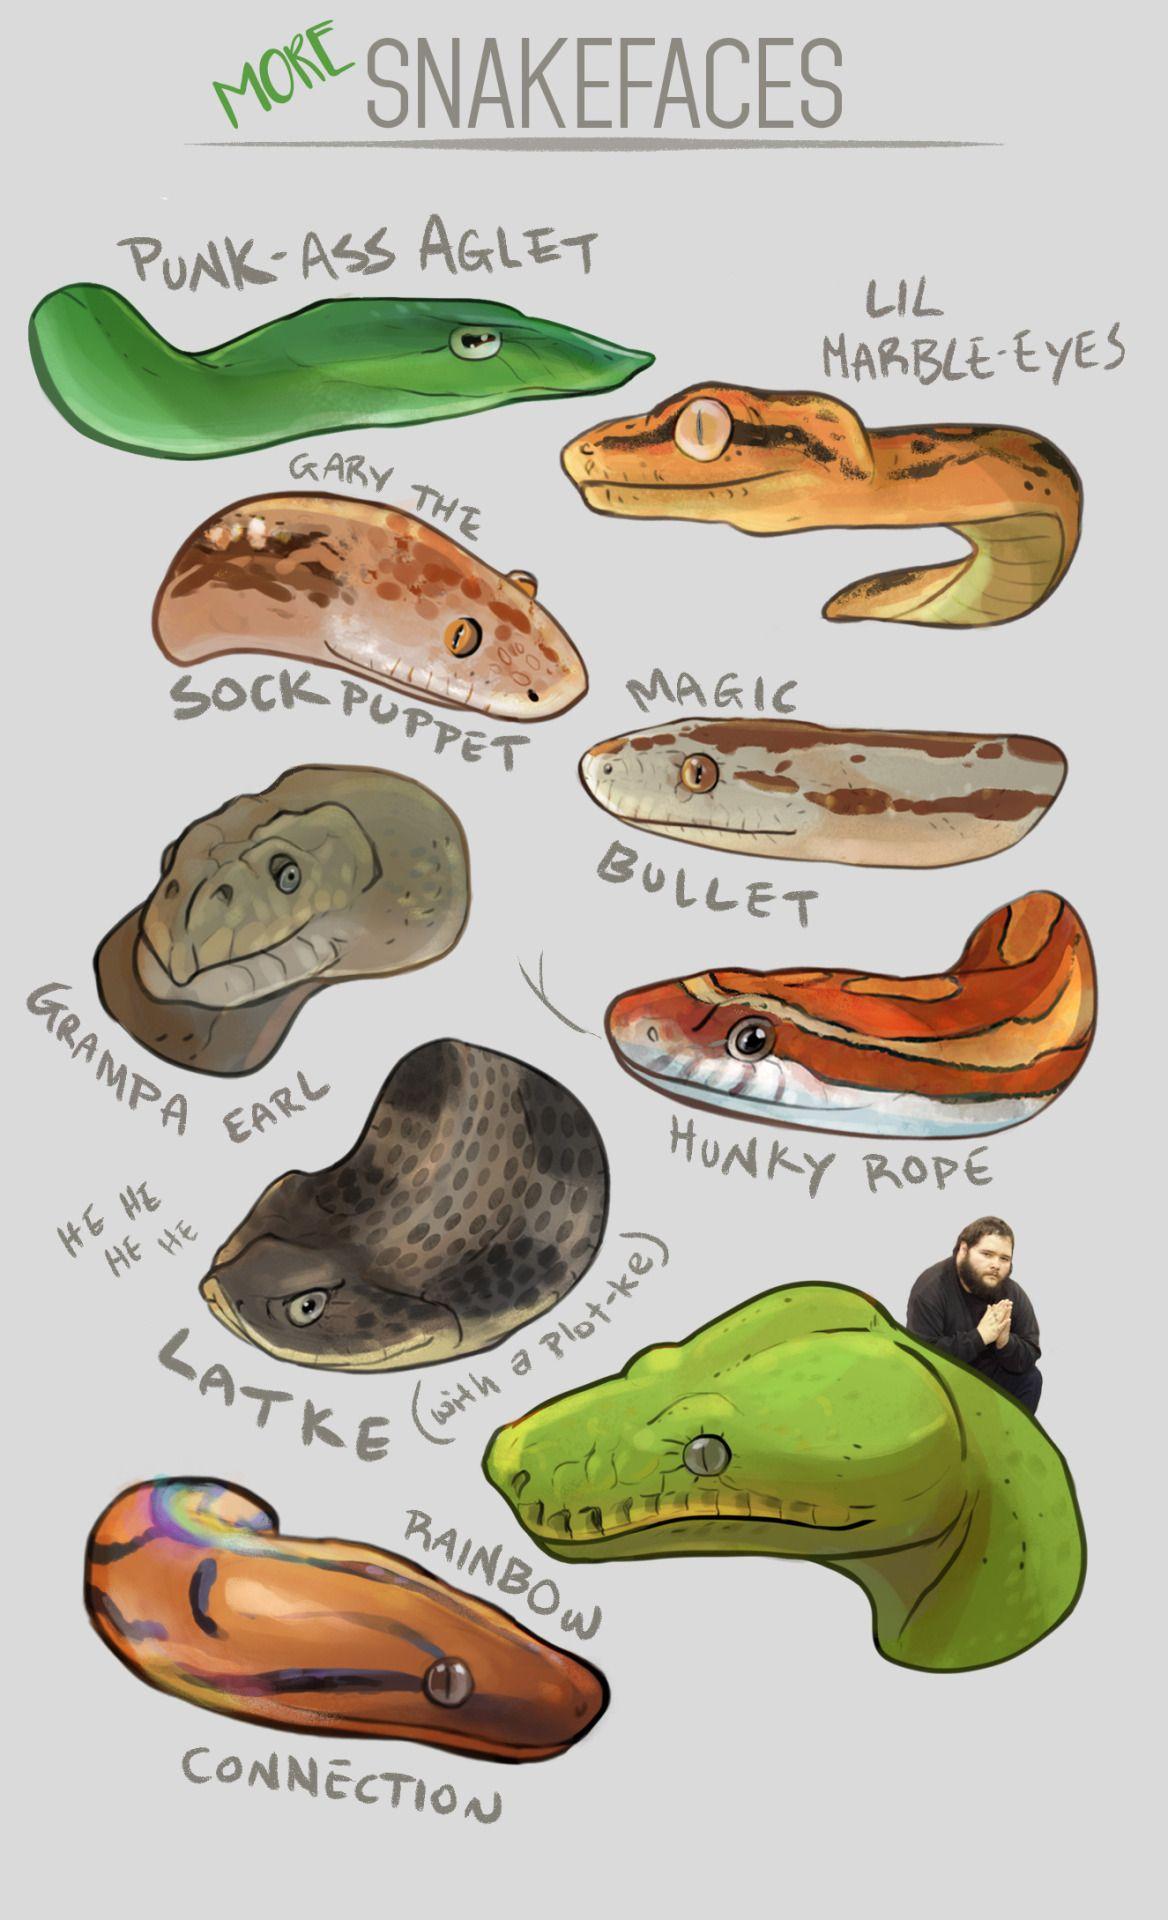 Moar snek face   Sneks n\' Gecks   Pinterest   Face, Snake and Reptiles